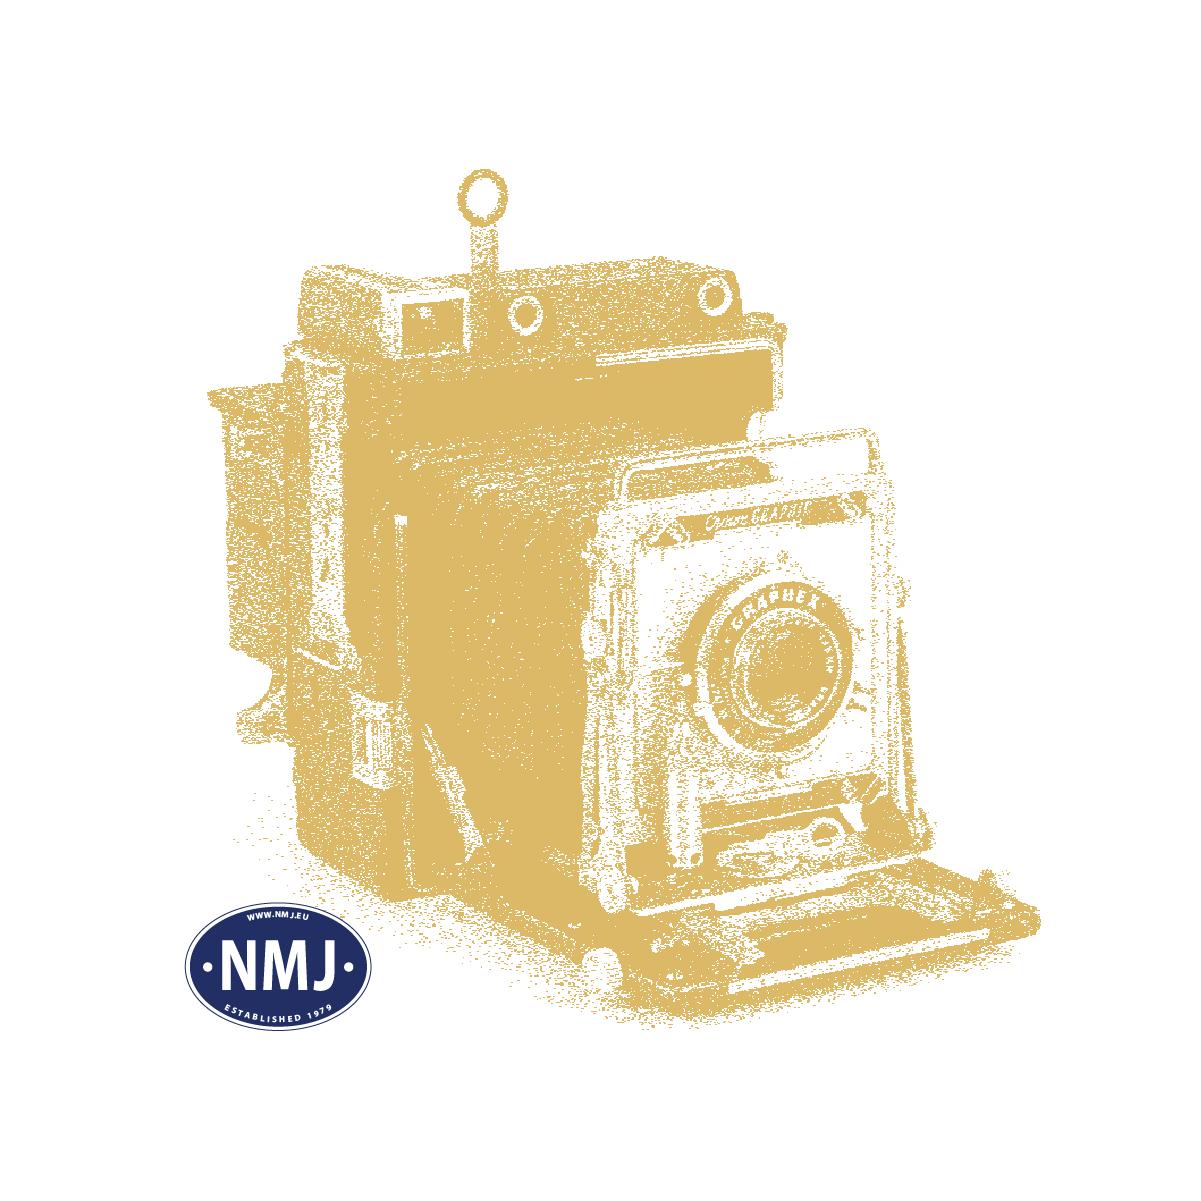 NMJT507.103 - NMJ Topline CargoNet Lgns 42 76 443 2142-9, Linjegods Thermo